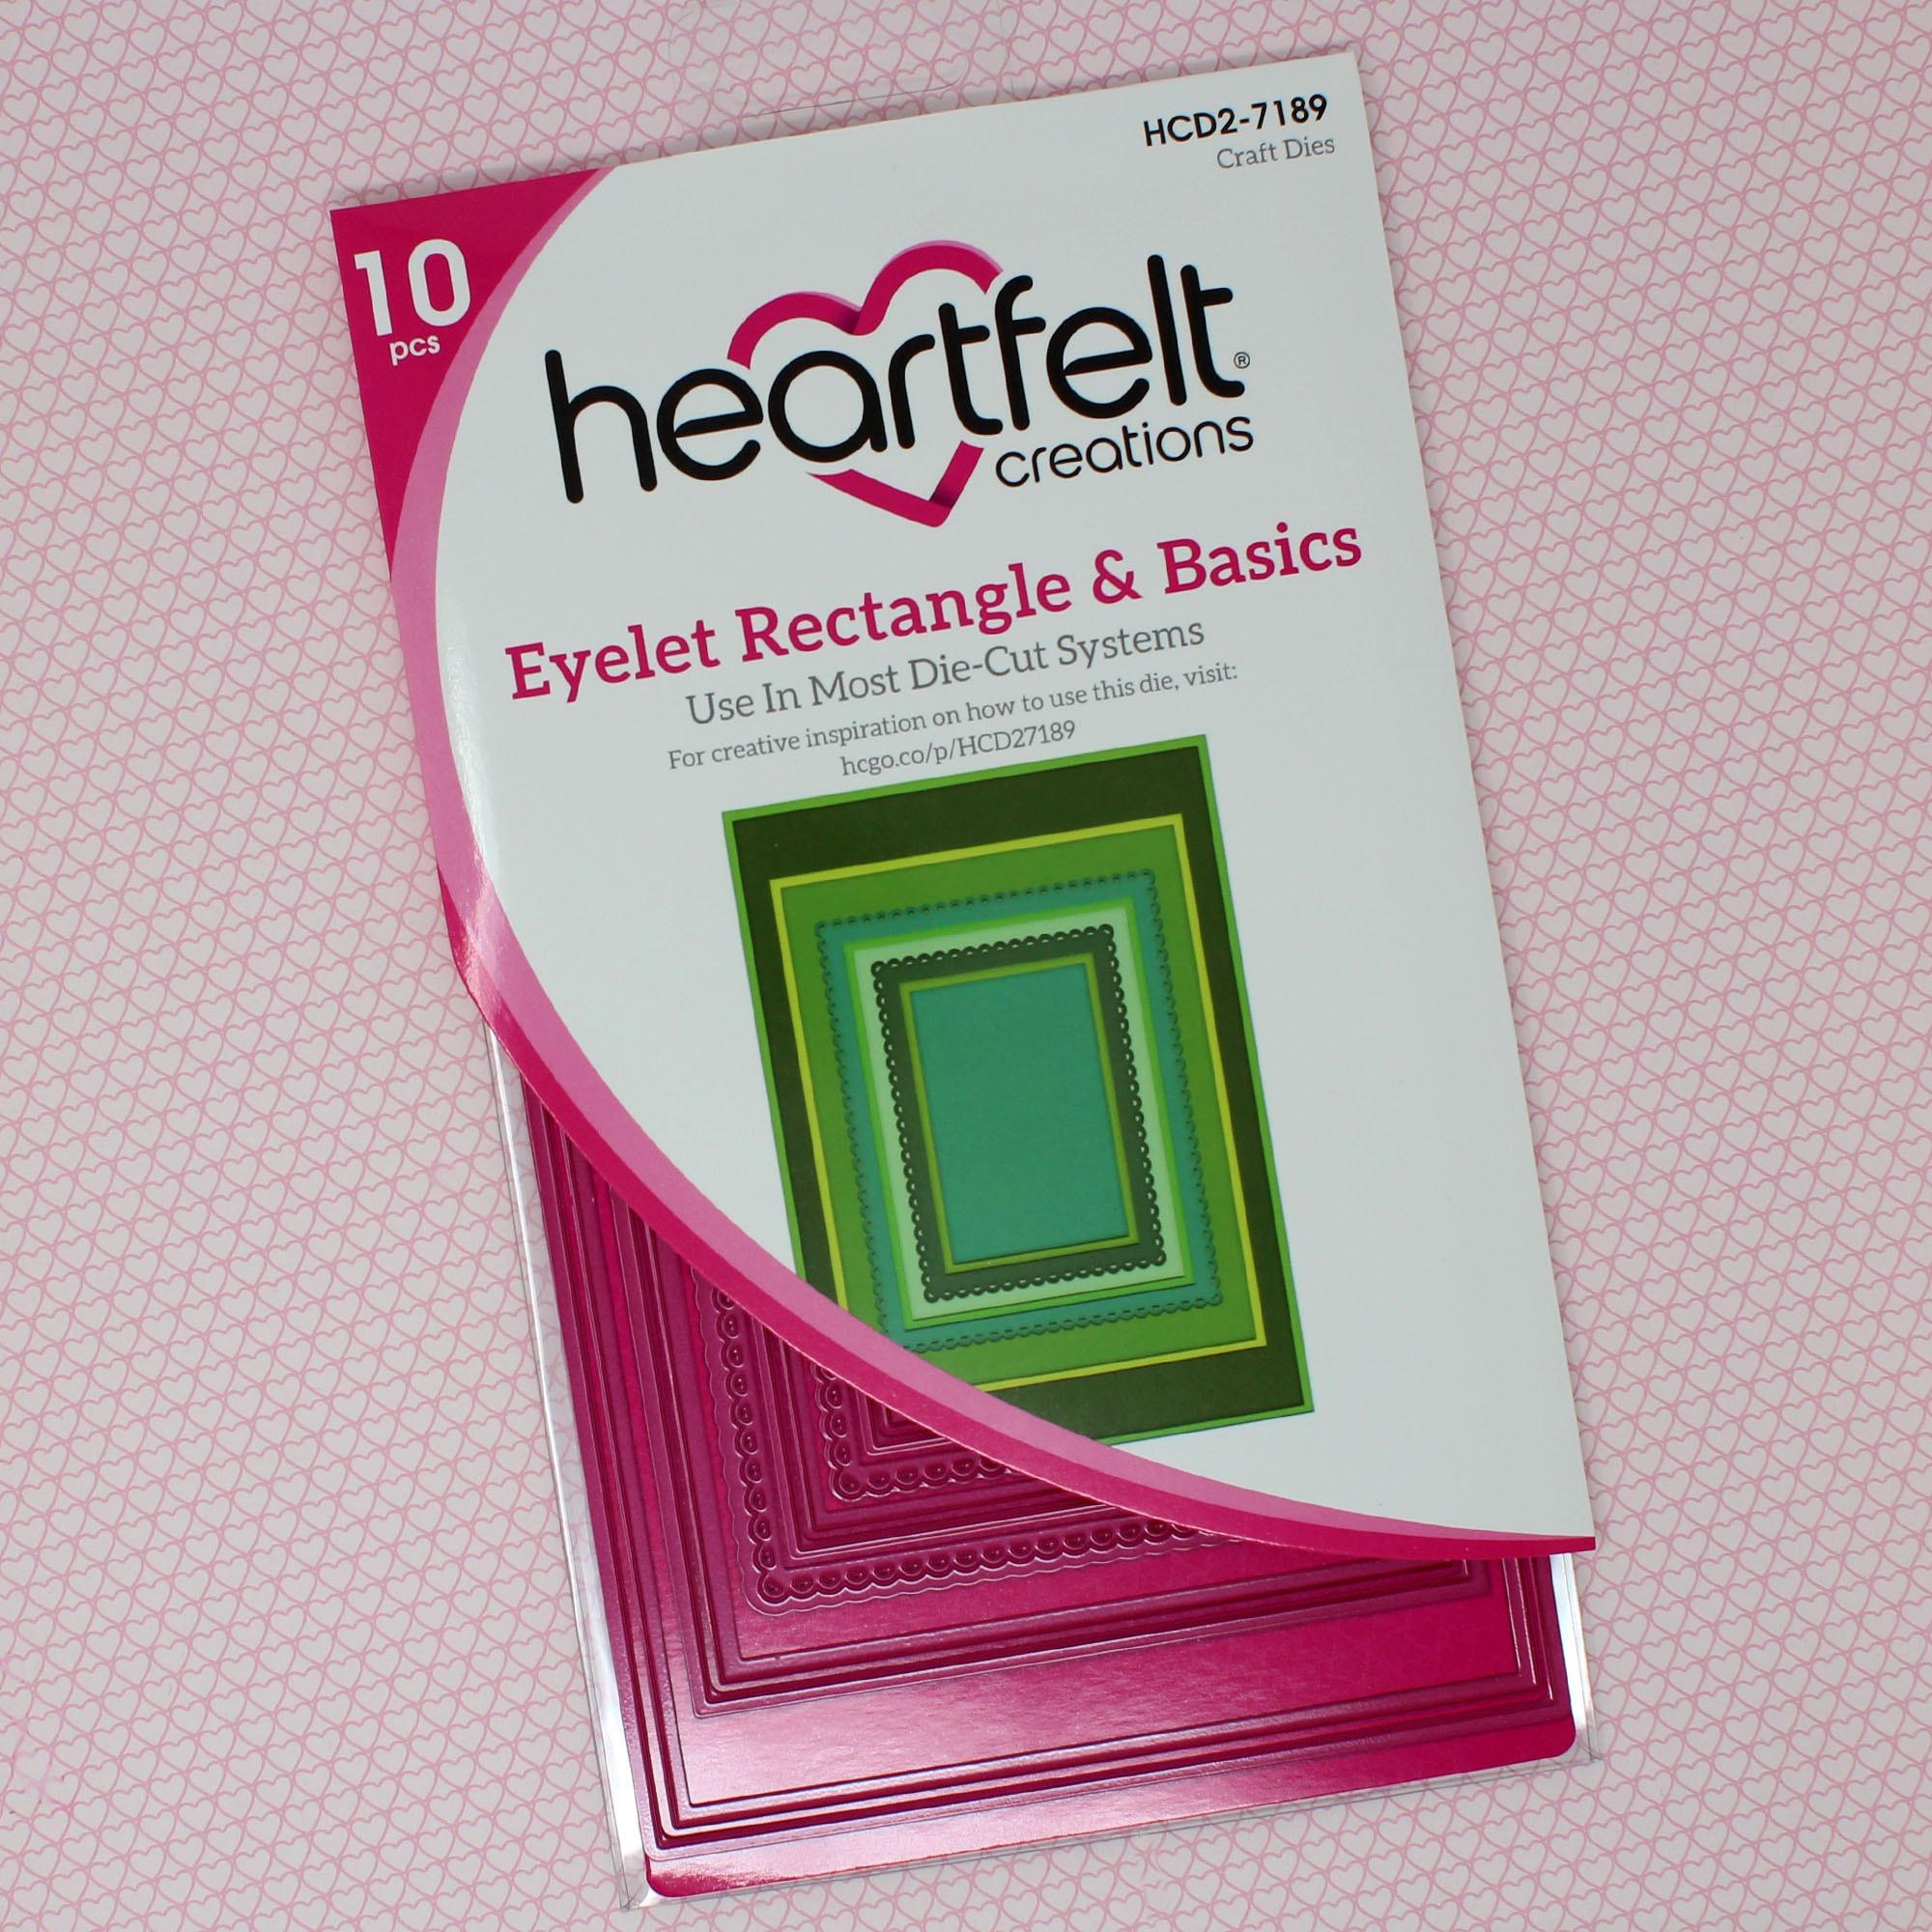 Eyelet Rectangle & Basics Die